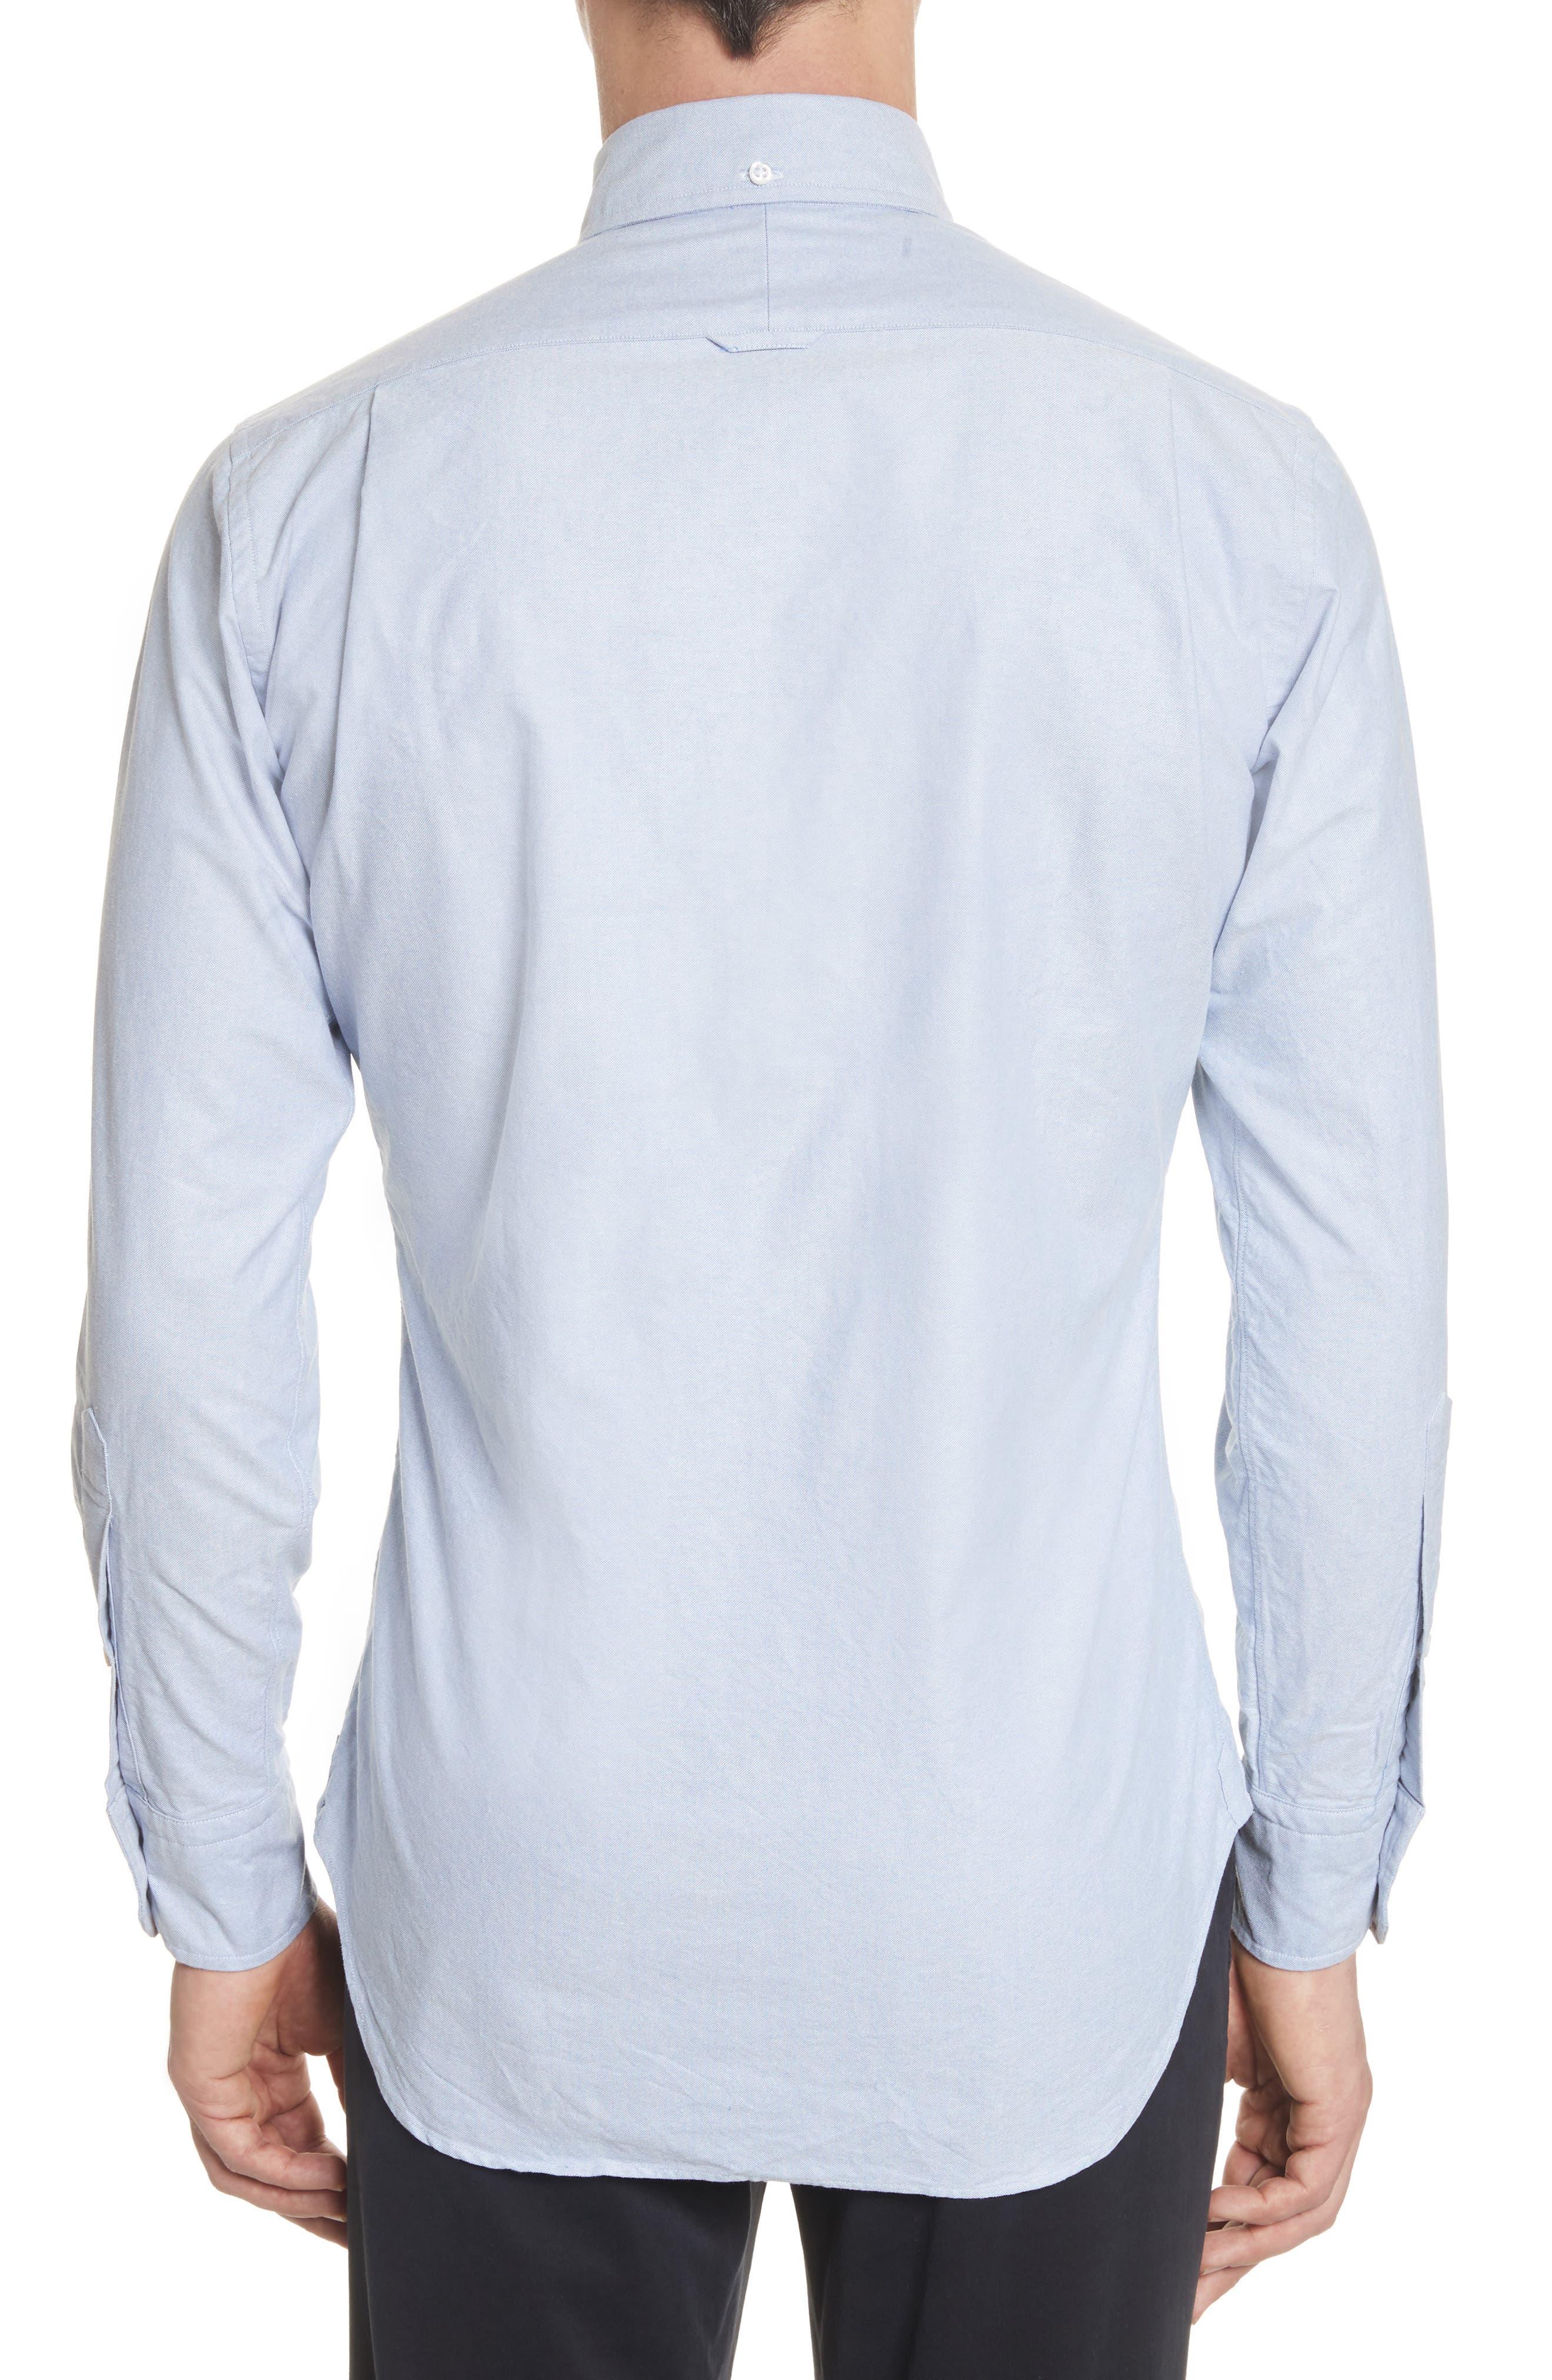 Extra Trim Fit Oxford Shirt with Grosgrain Trim,                             Alternate thumbnail 3, color,                             LIGHT BLUE